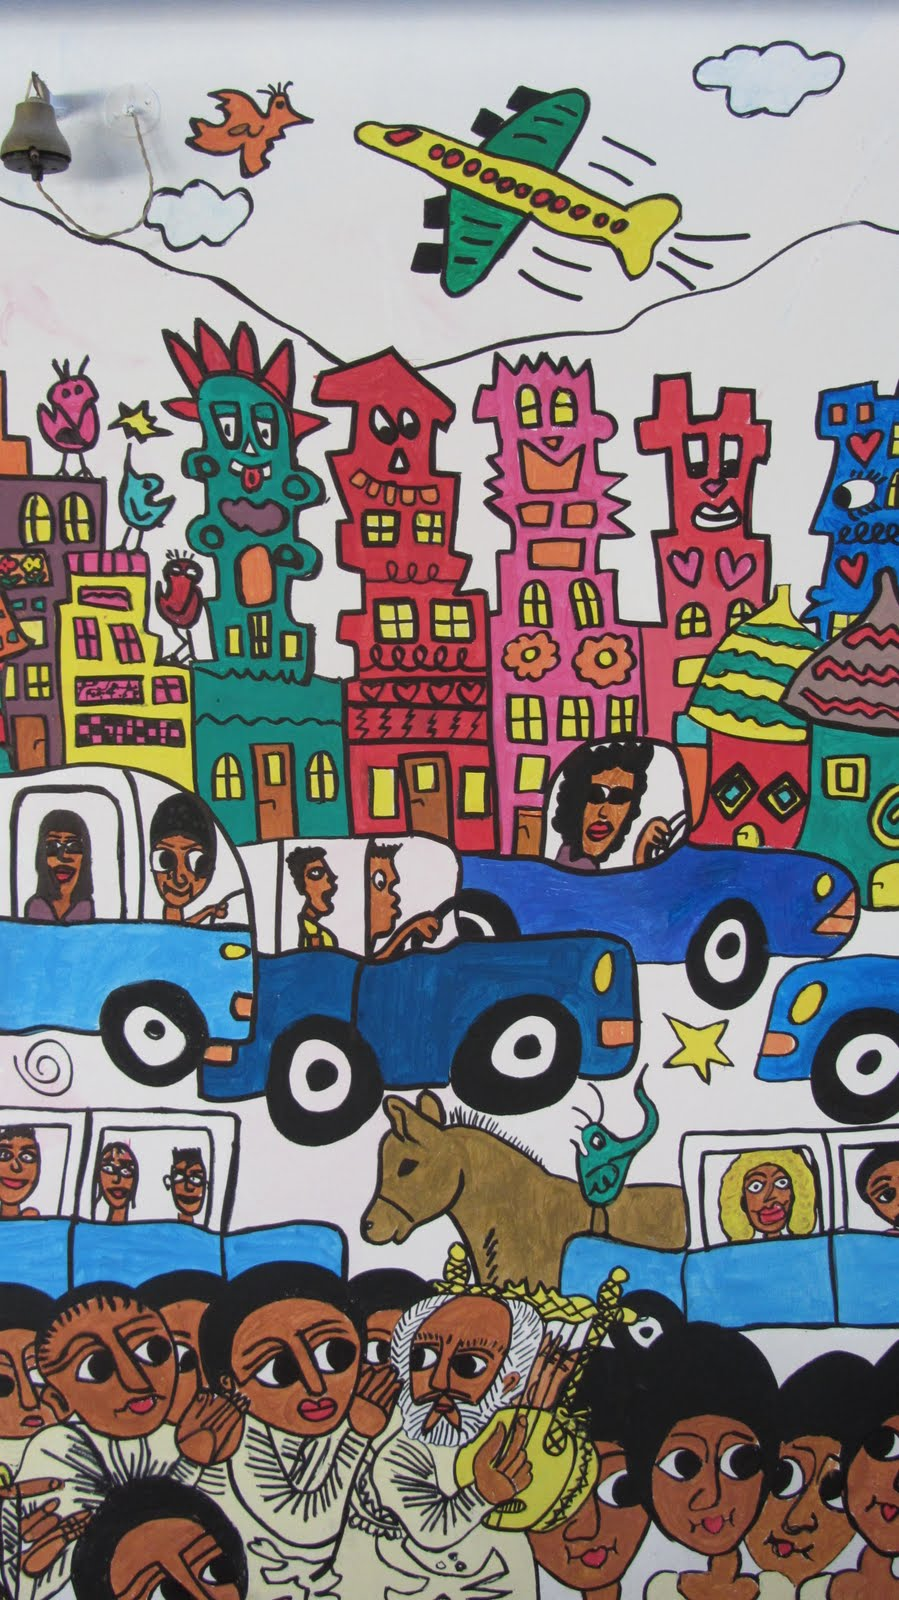 kunstraum: Rizzi nun auch in Addis Abeba